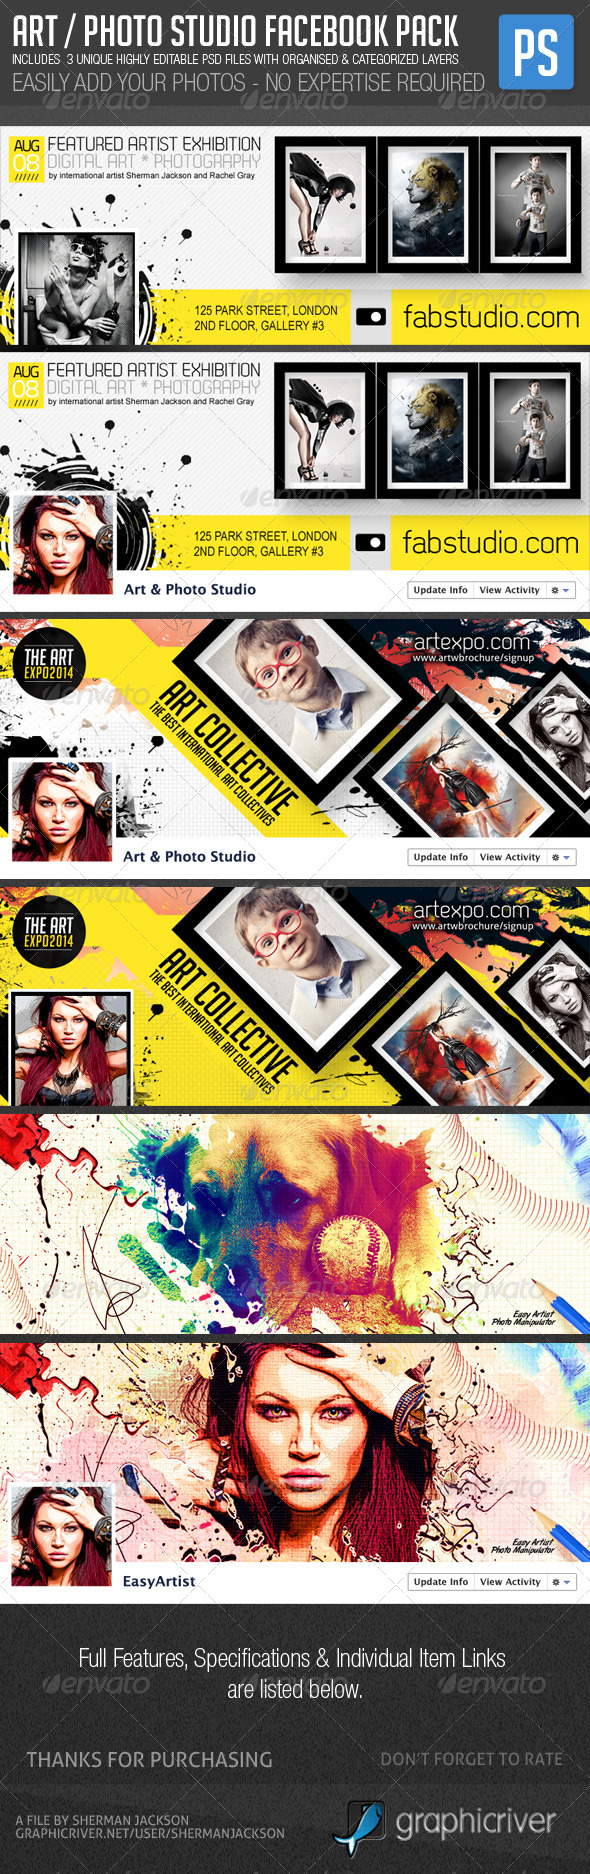 Art Photo Facebook Cover Premium Pack - Facebook Timeline Covers Social Media